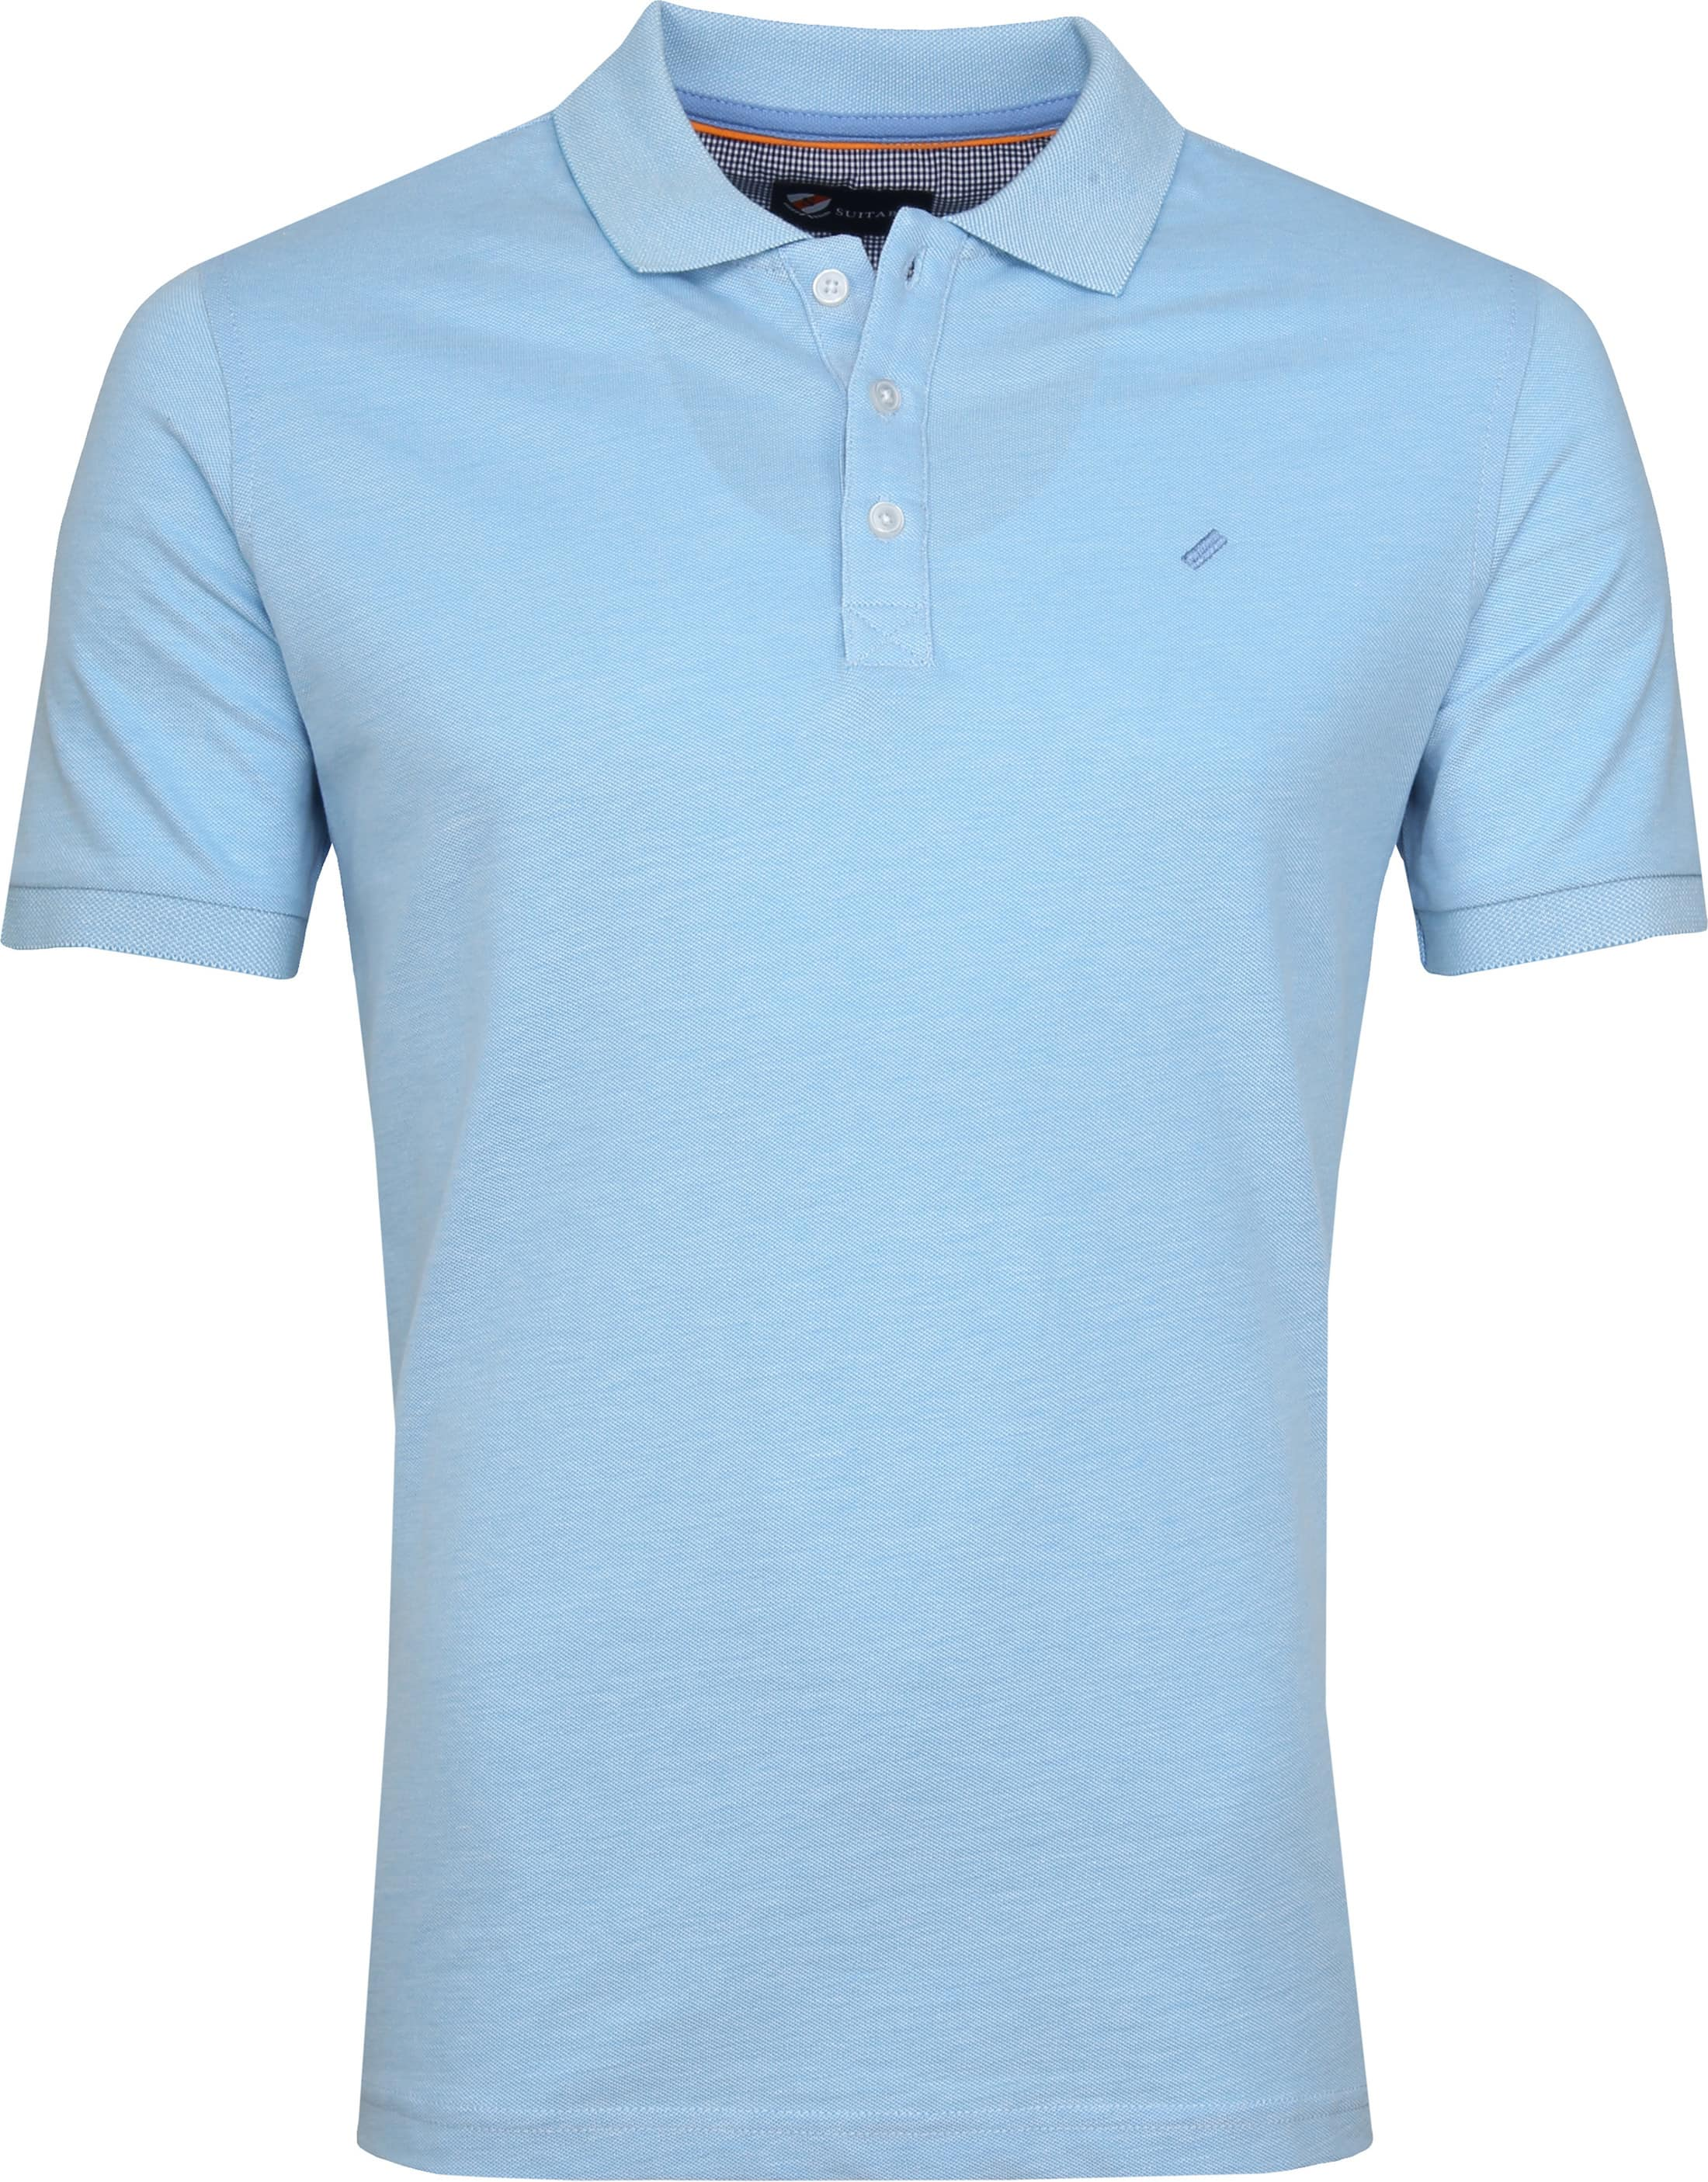 huge discount b1ac9 d23ab Suitable Oxford Poloshirt Blau S-252-OxfBlue online kaufen ...